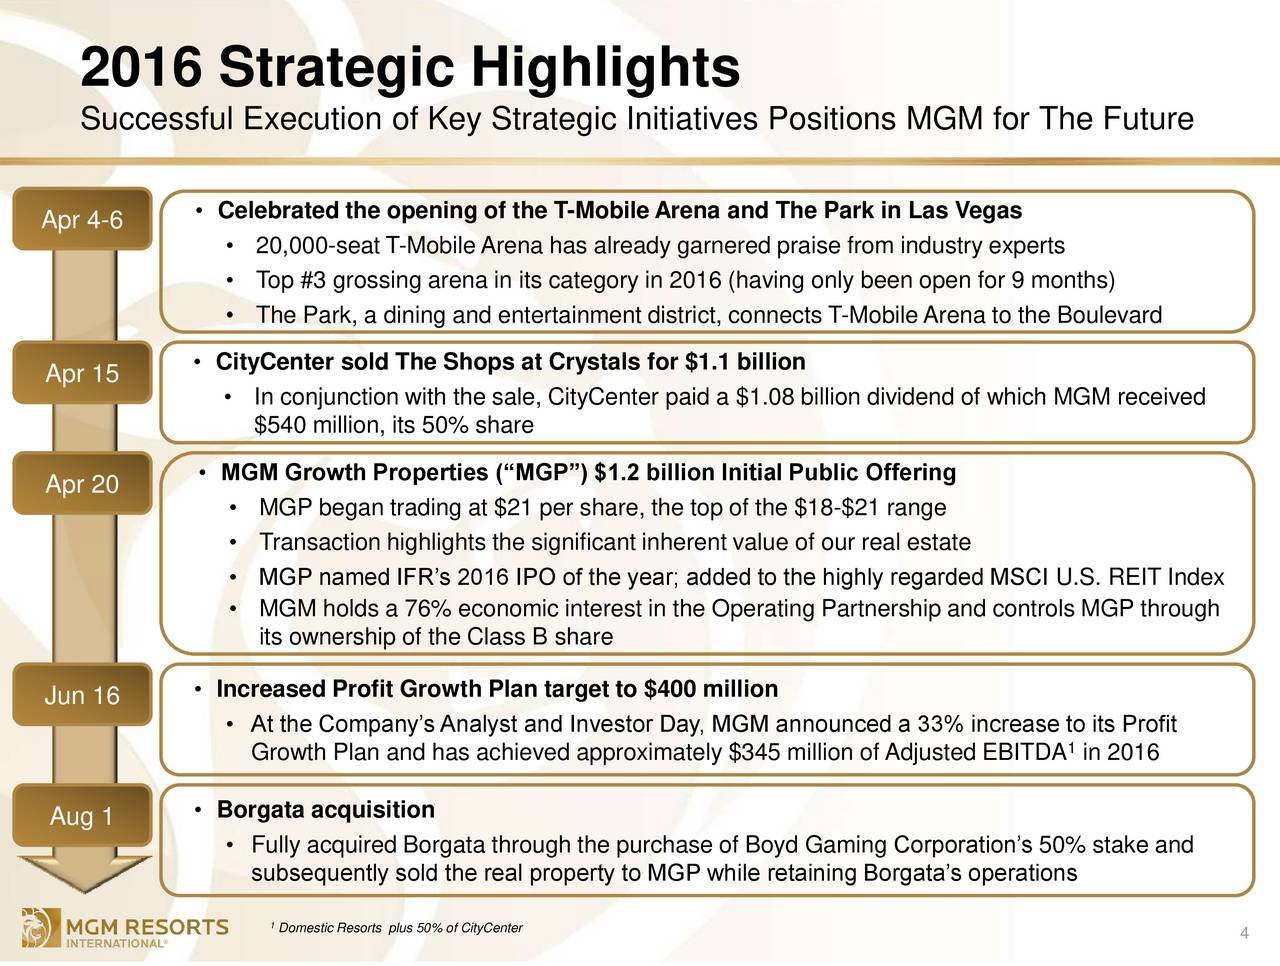 mgm resorts international 2016 q4 results earnings call slides mgm resorts international 2016 q4 results earnings call slides mgm resorts international nyse mgm seeking alpha